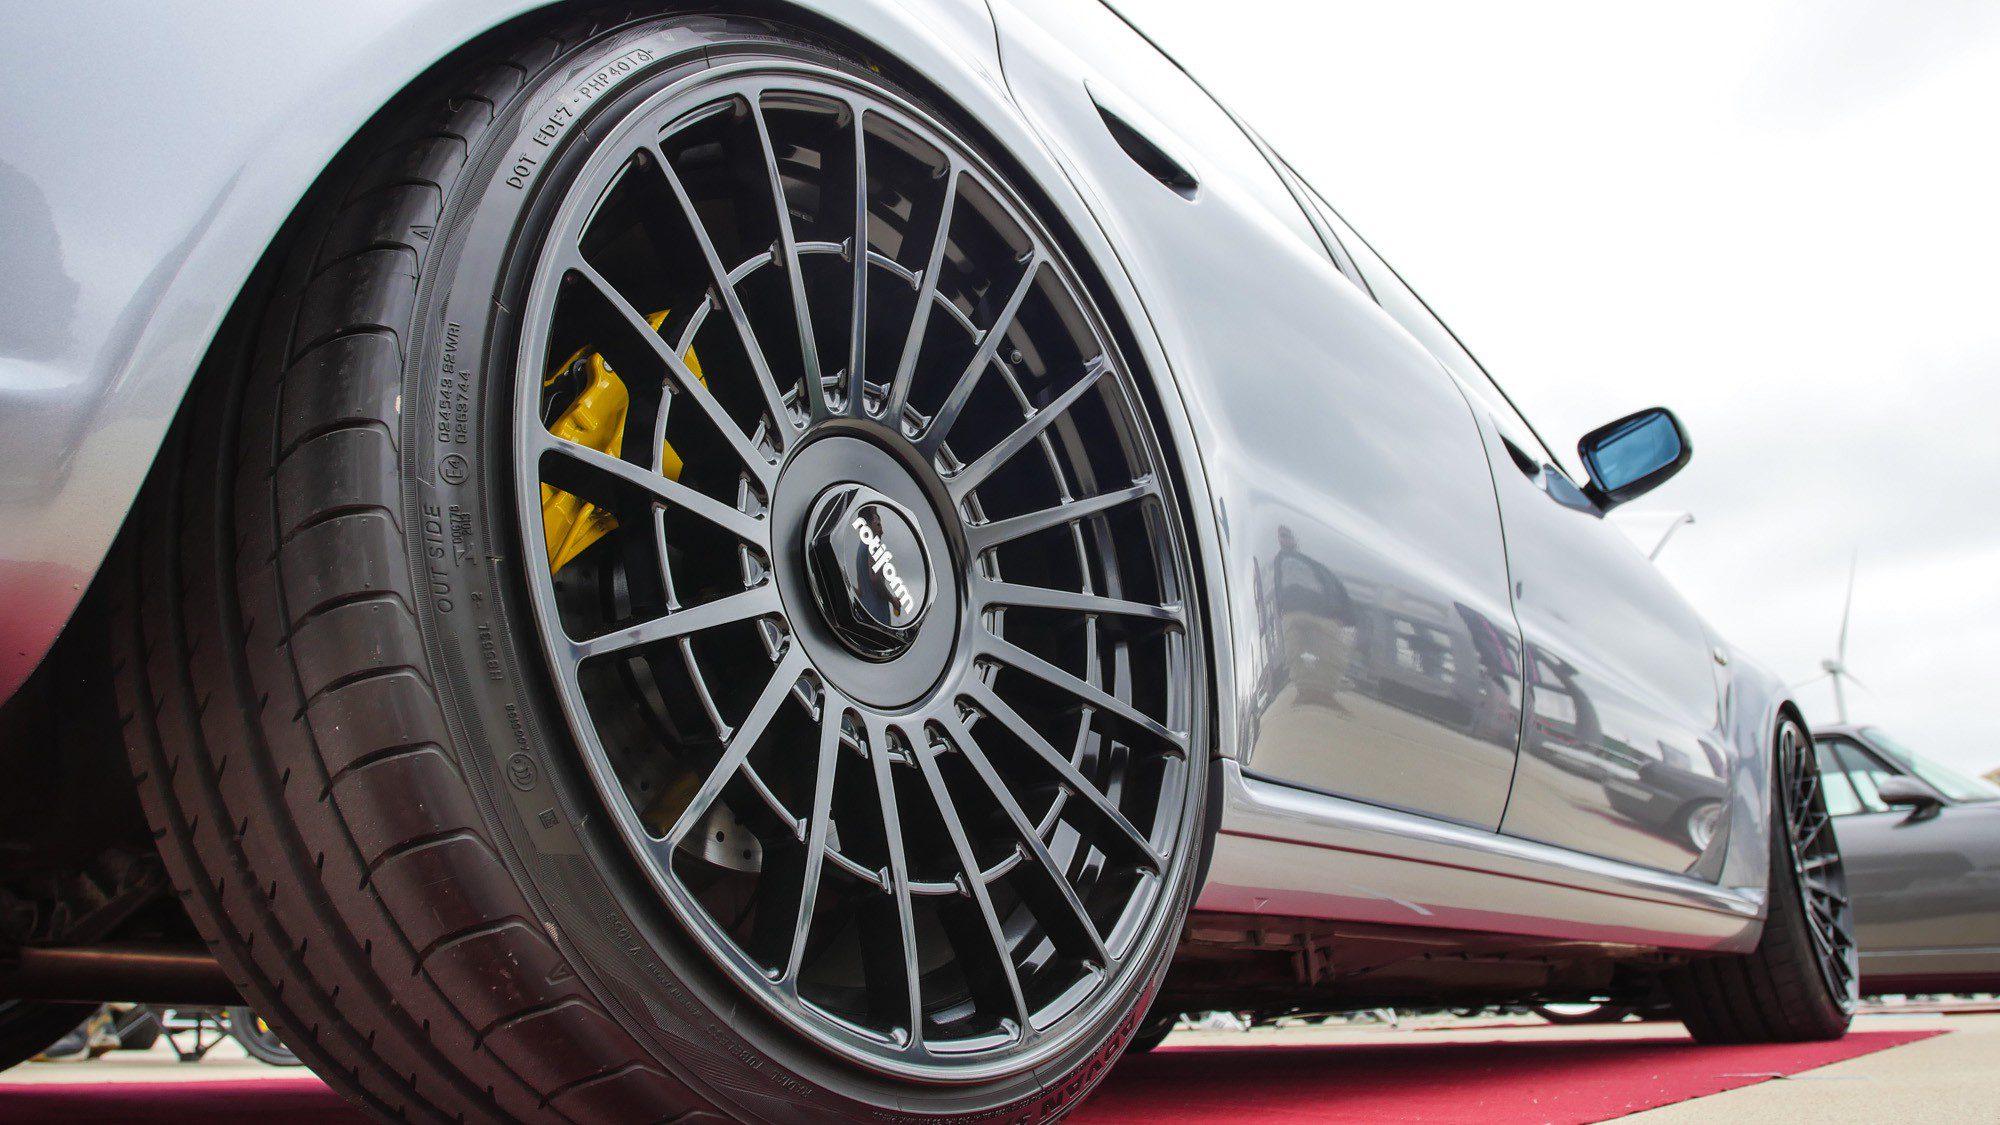 Fette Rotiform-Räder auf dem Audi RS4